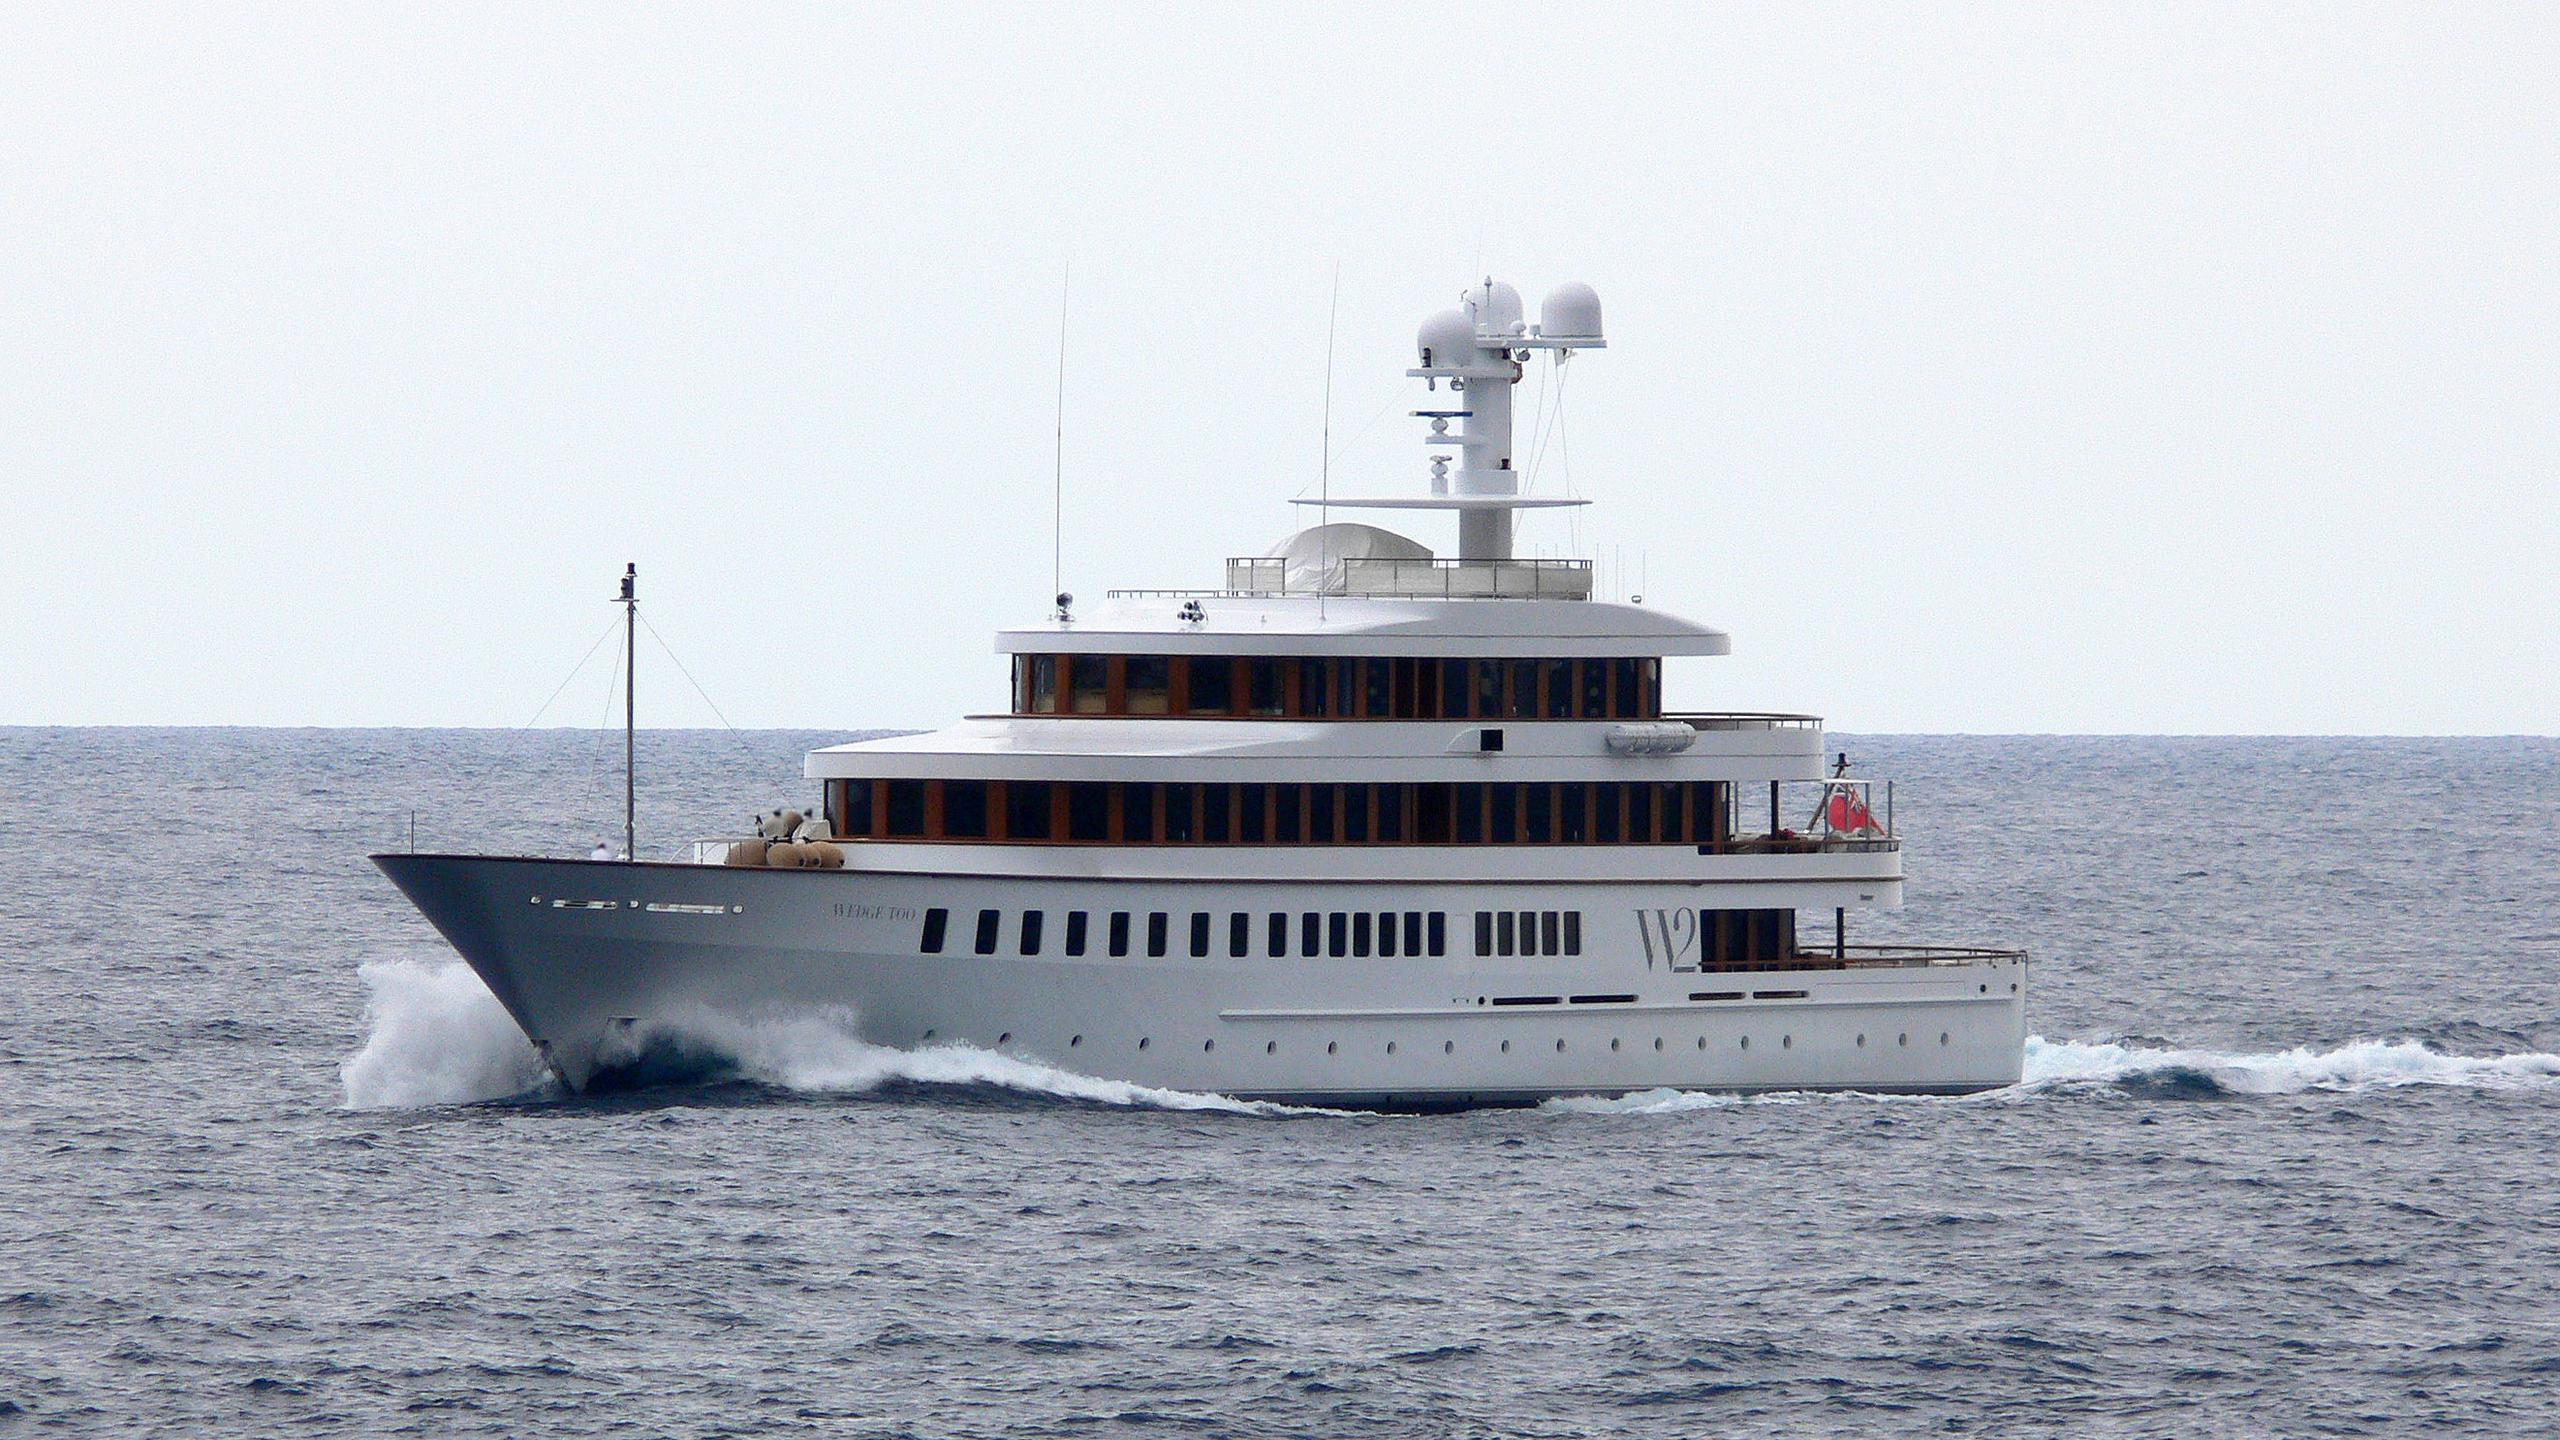 wedge-too-rmotor-yacht-feadship-2002-65m-half-profile